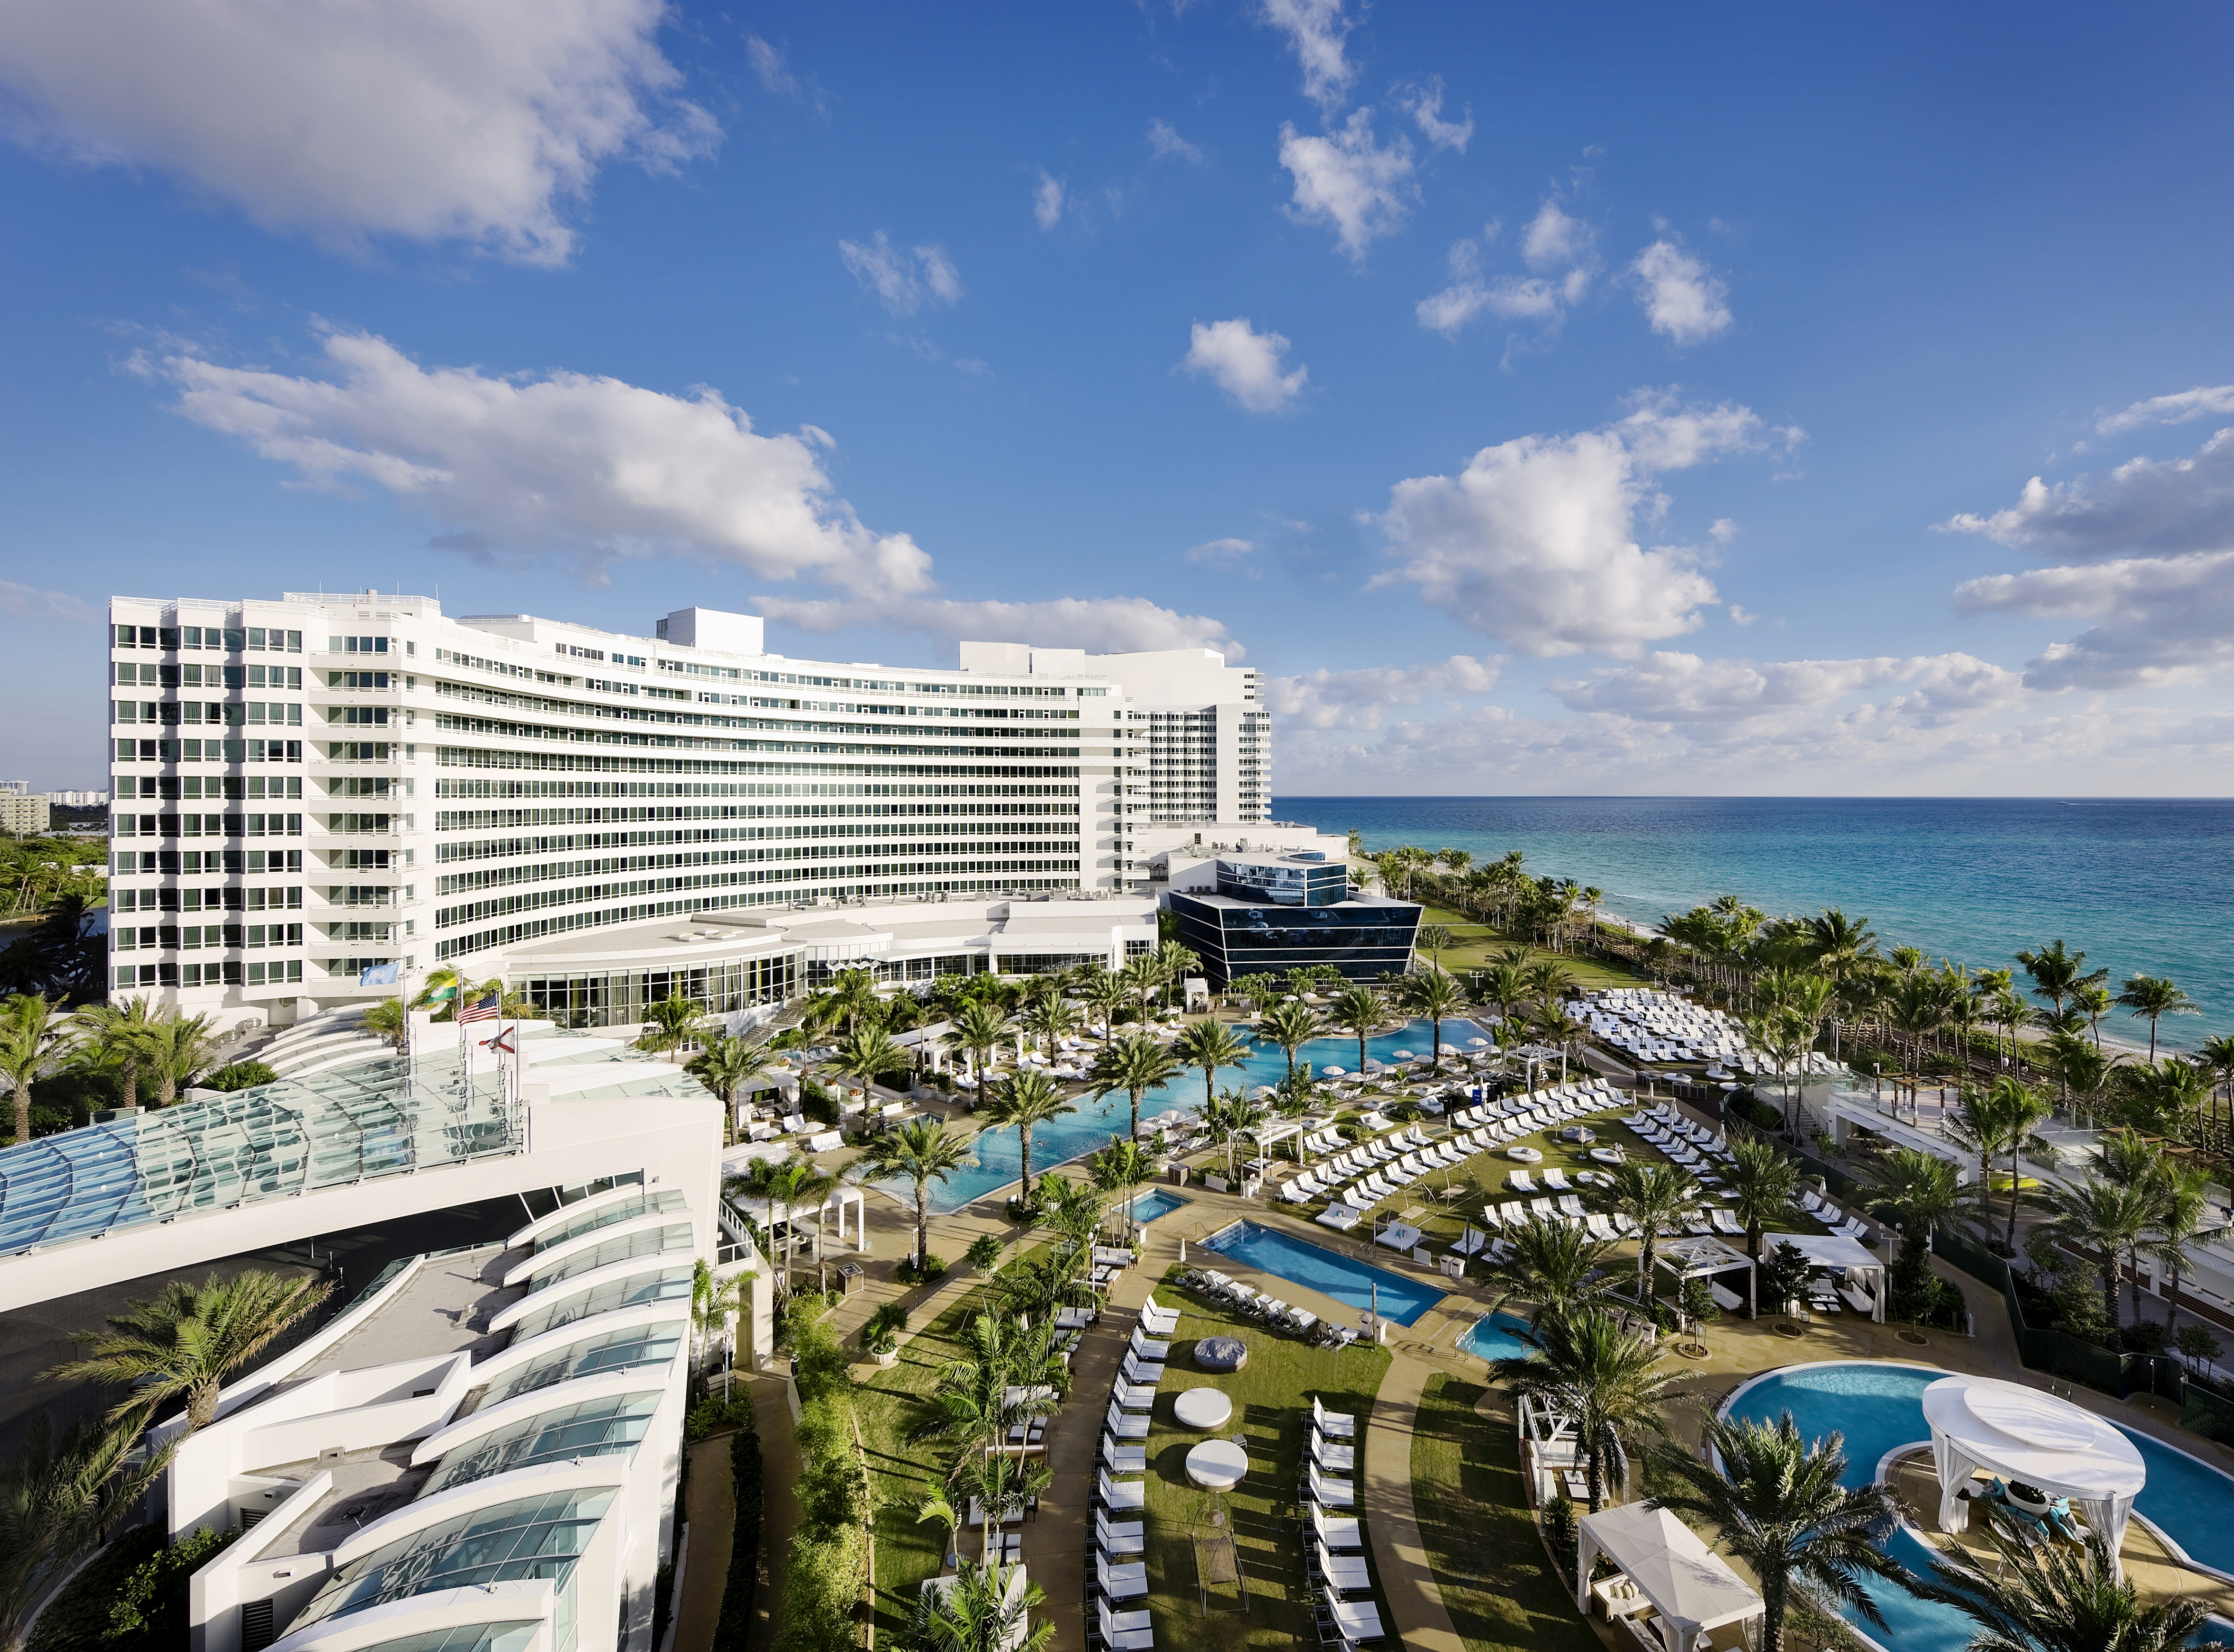 beach hotels to south miami free washington do wph things gardens blog park cheap picks in garden